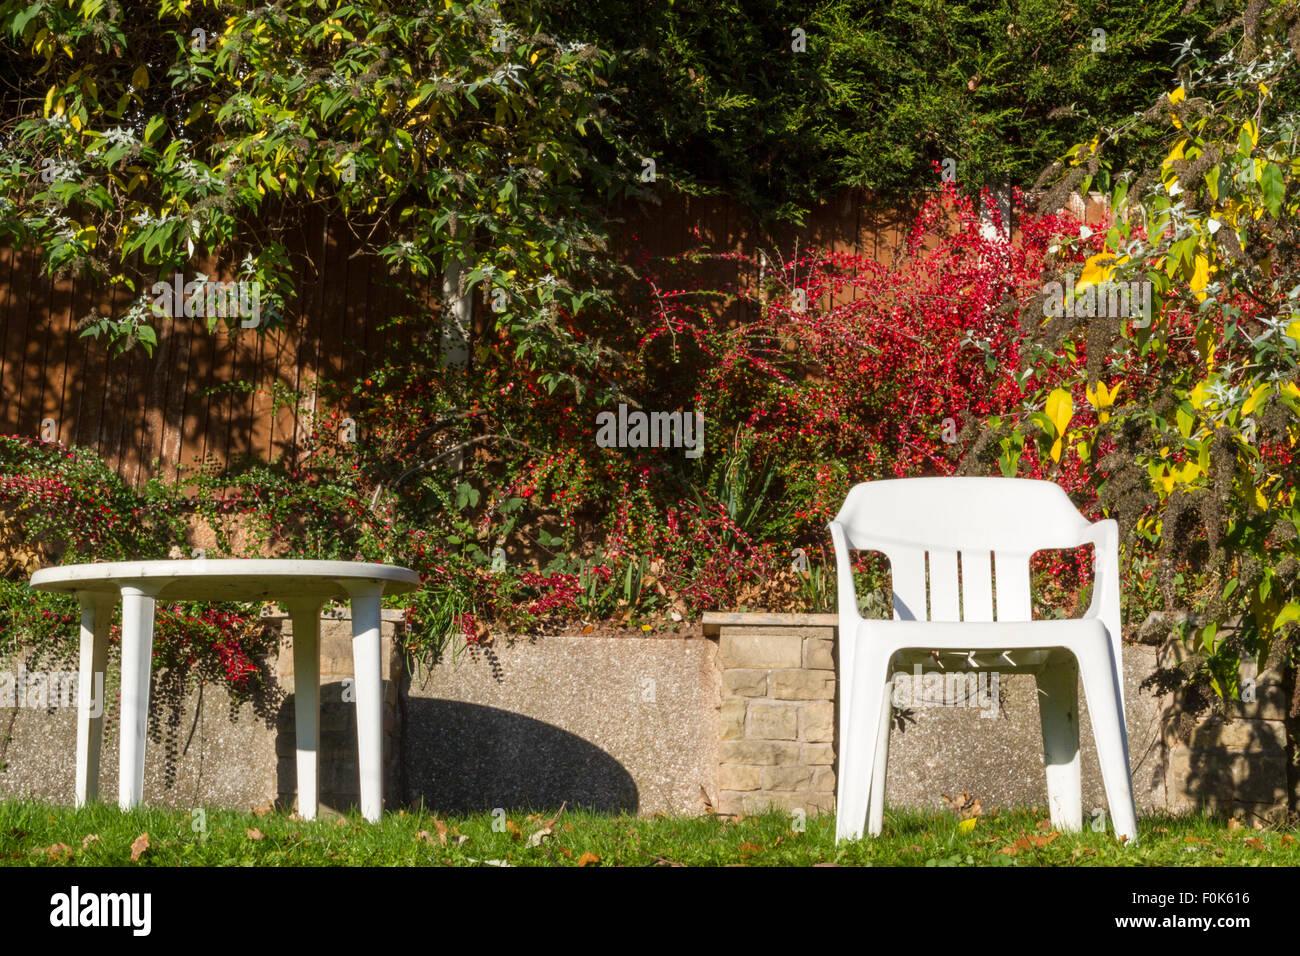 Plastic Garden Furniture Stock Photos & Plastic Garden Furniture ...